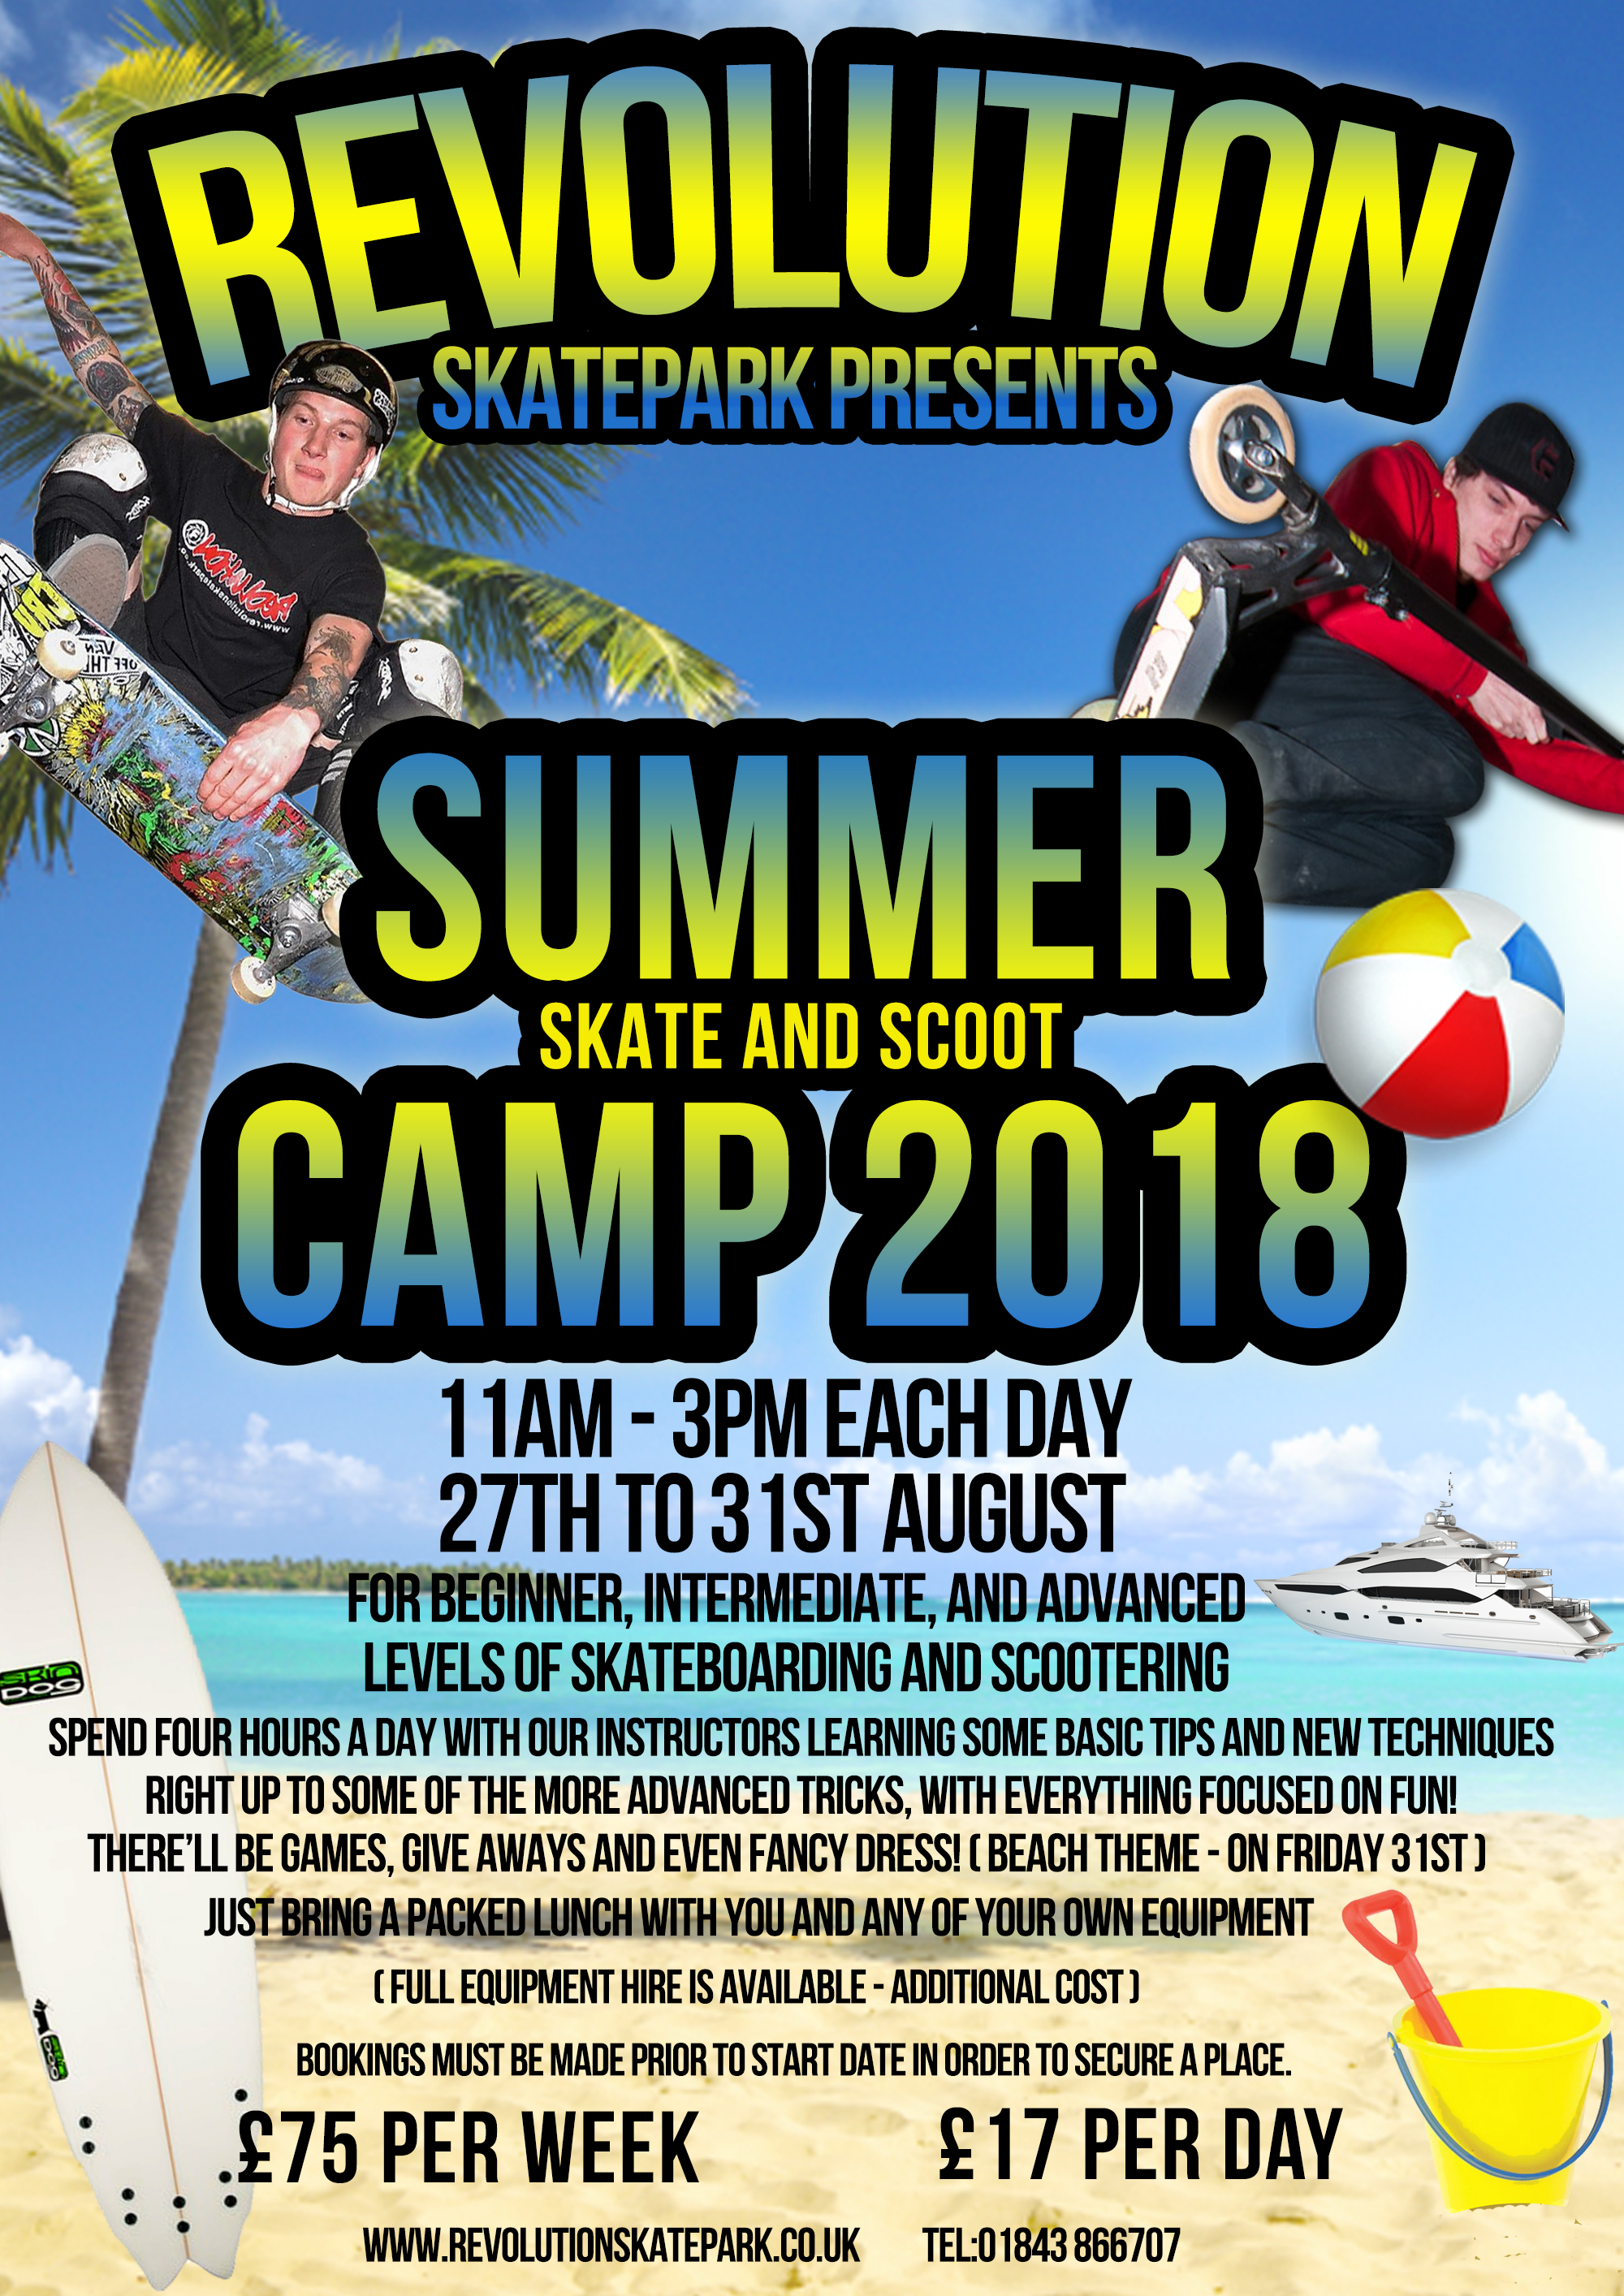 Skate & Scoot Camp - Summer 2